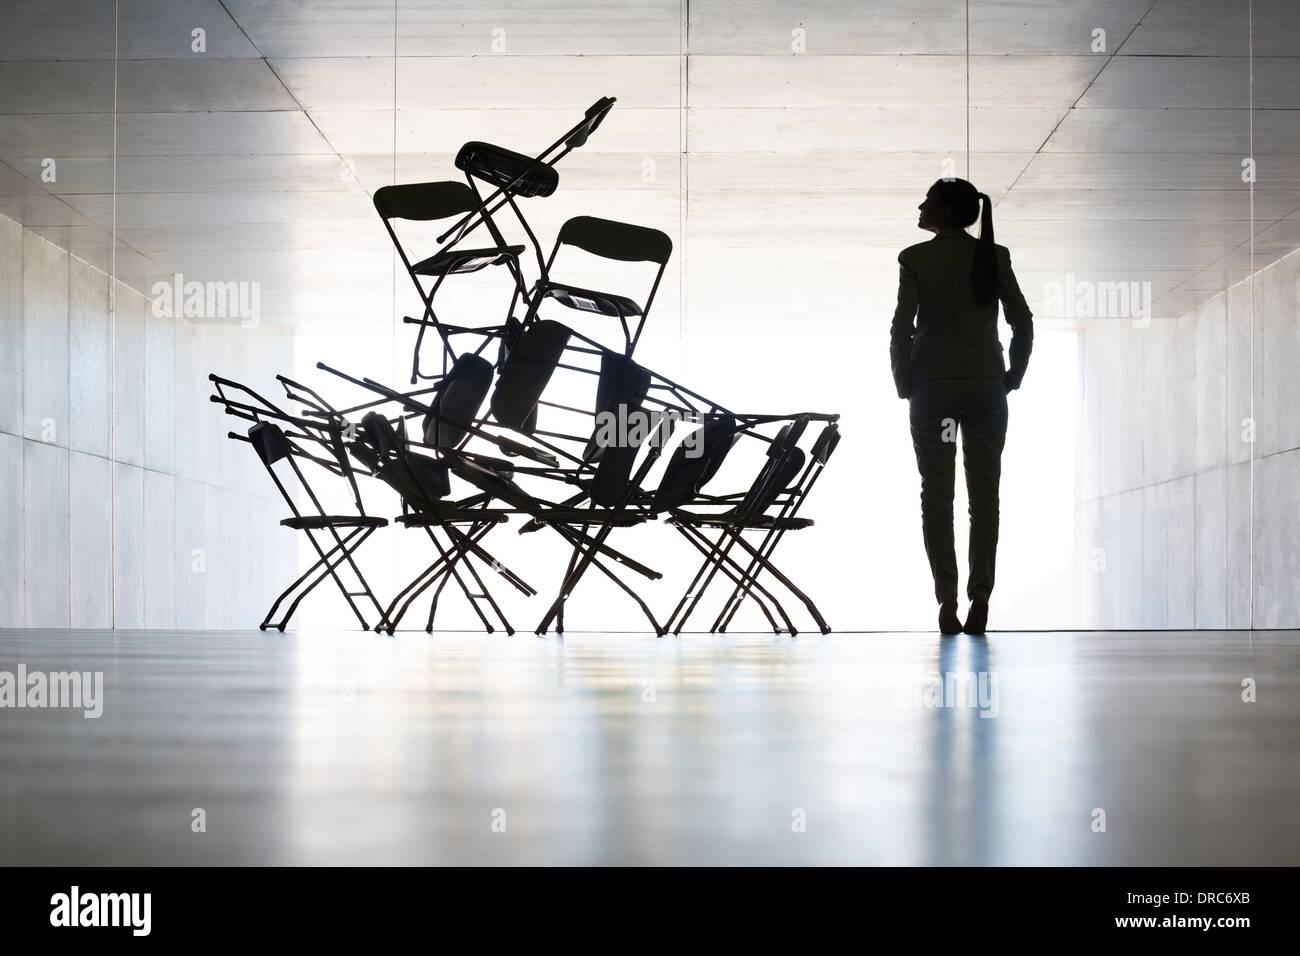 Businesswoman examining office chair installation art - Stock Image